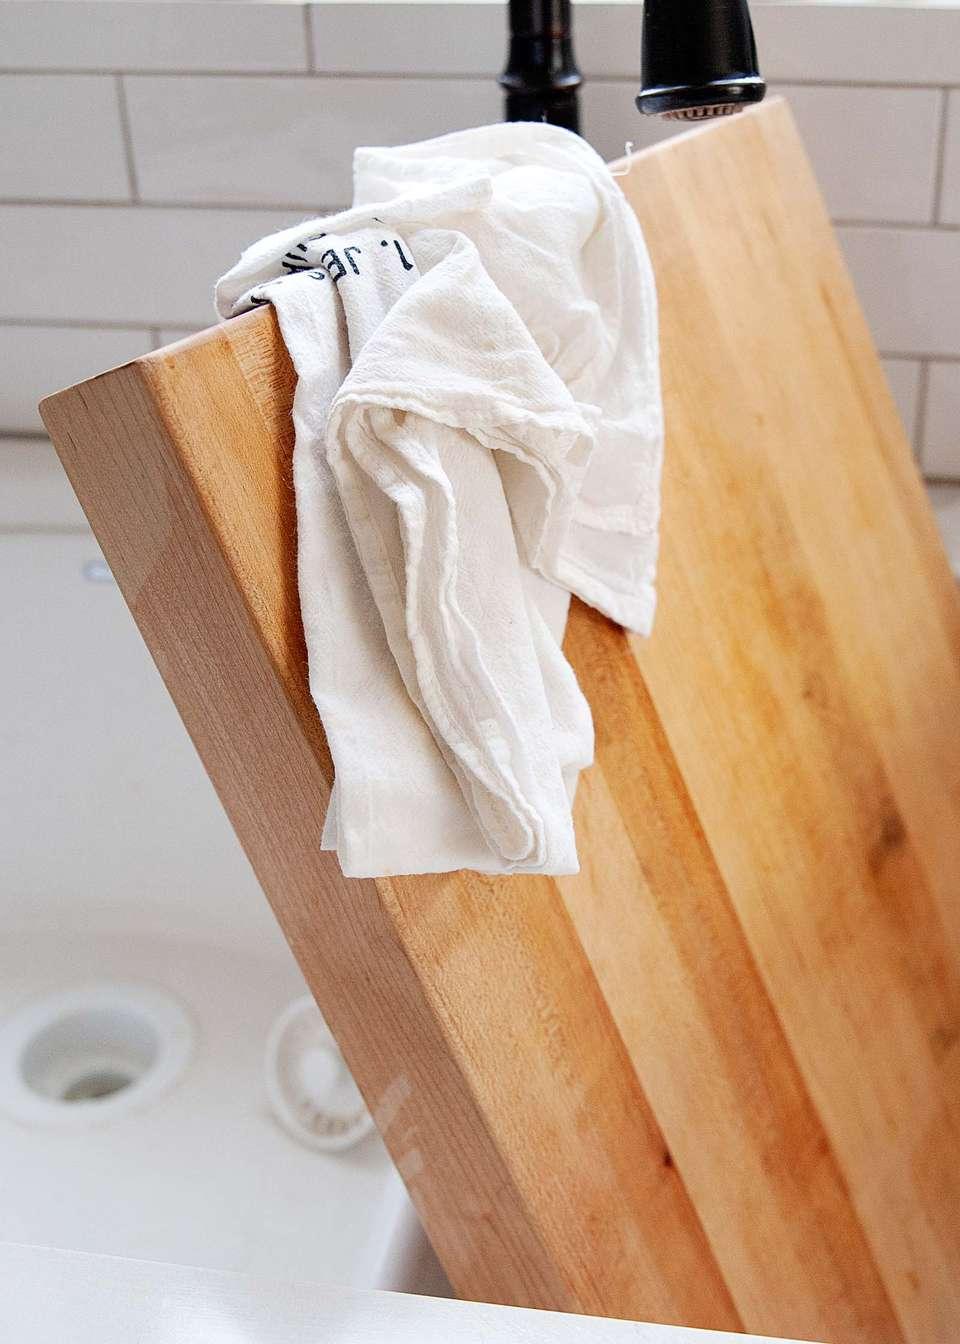 Dry cutting board thoroughly